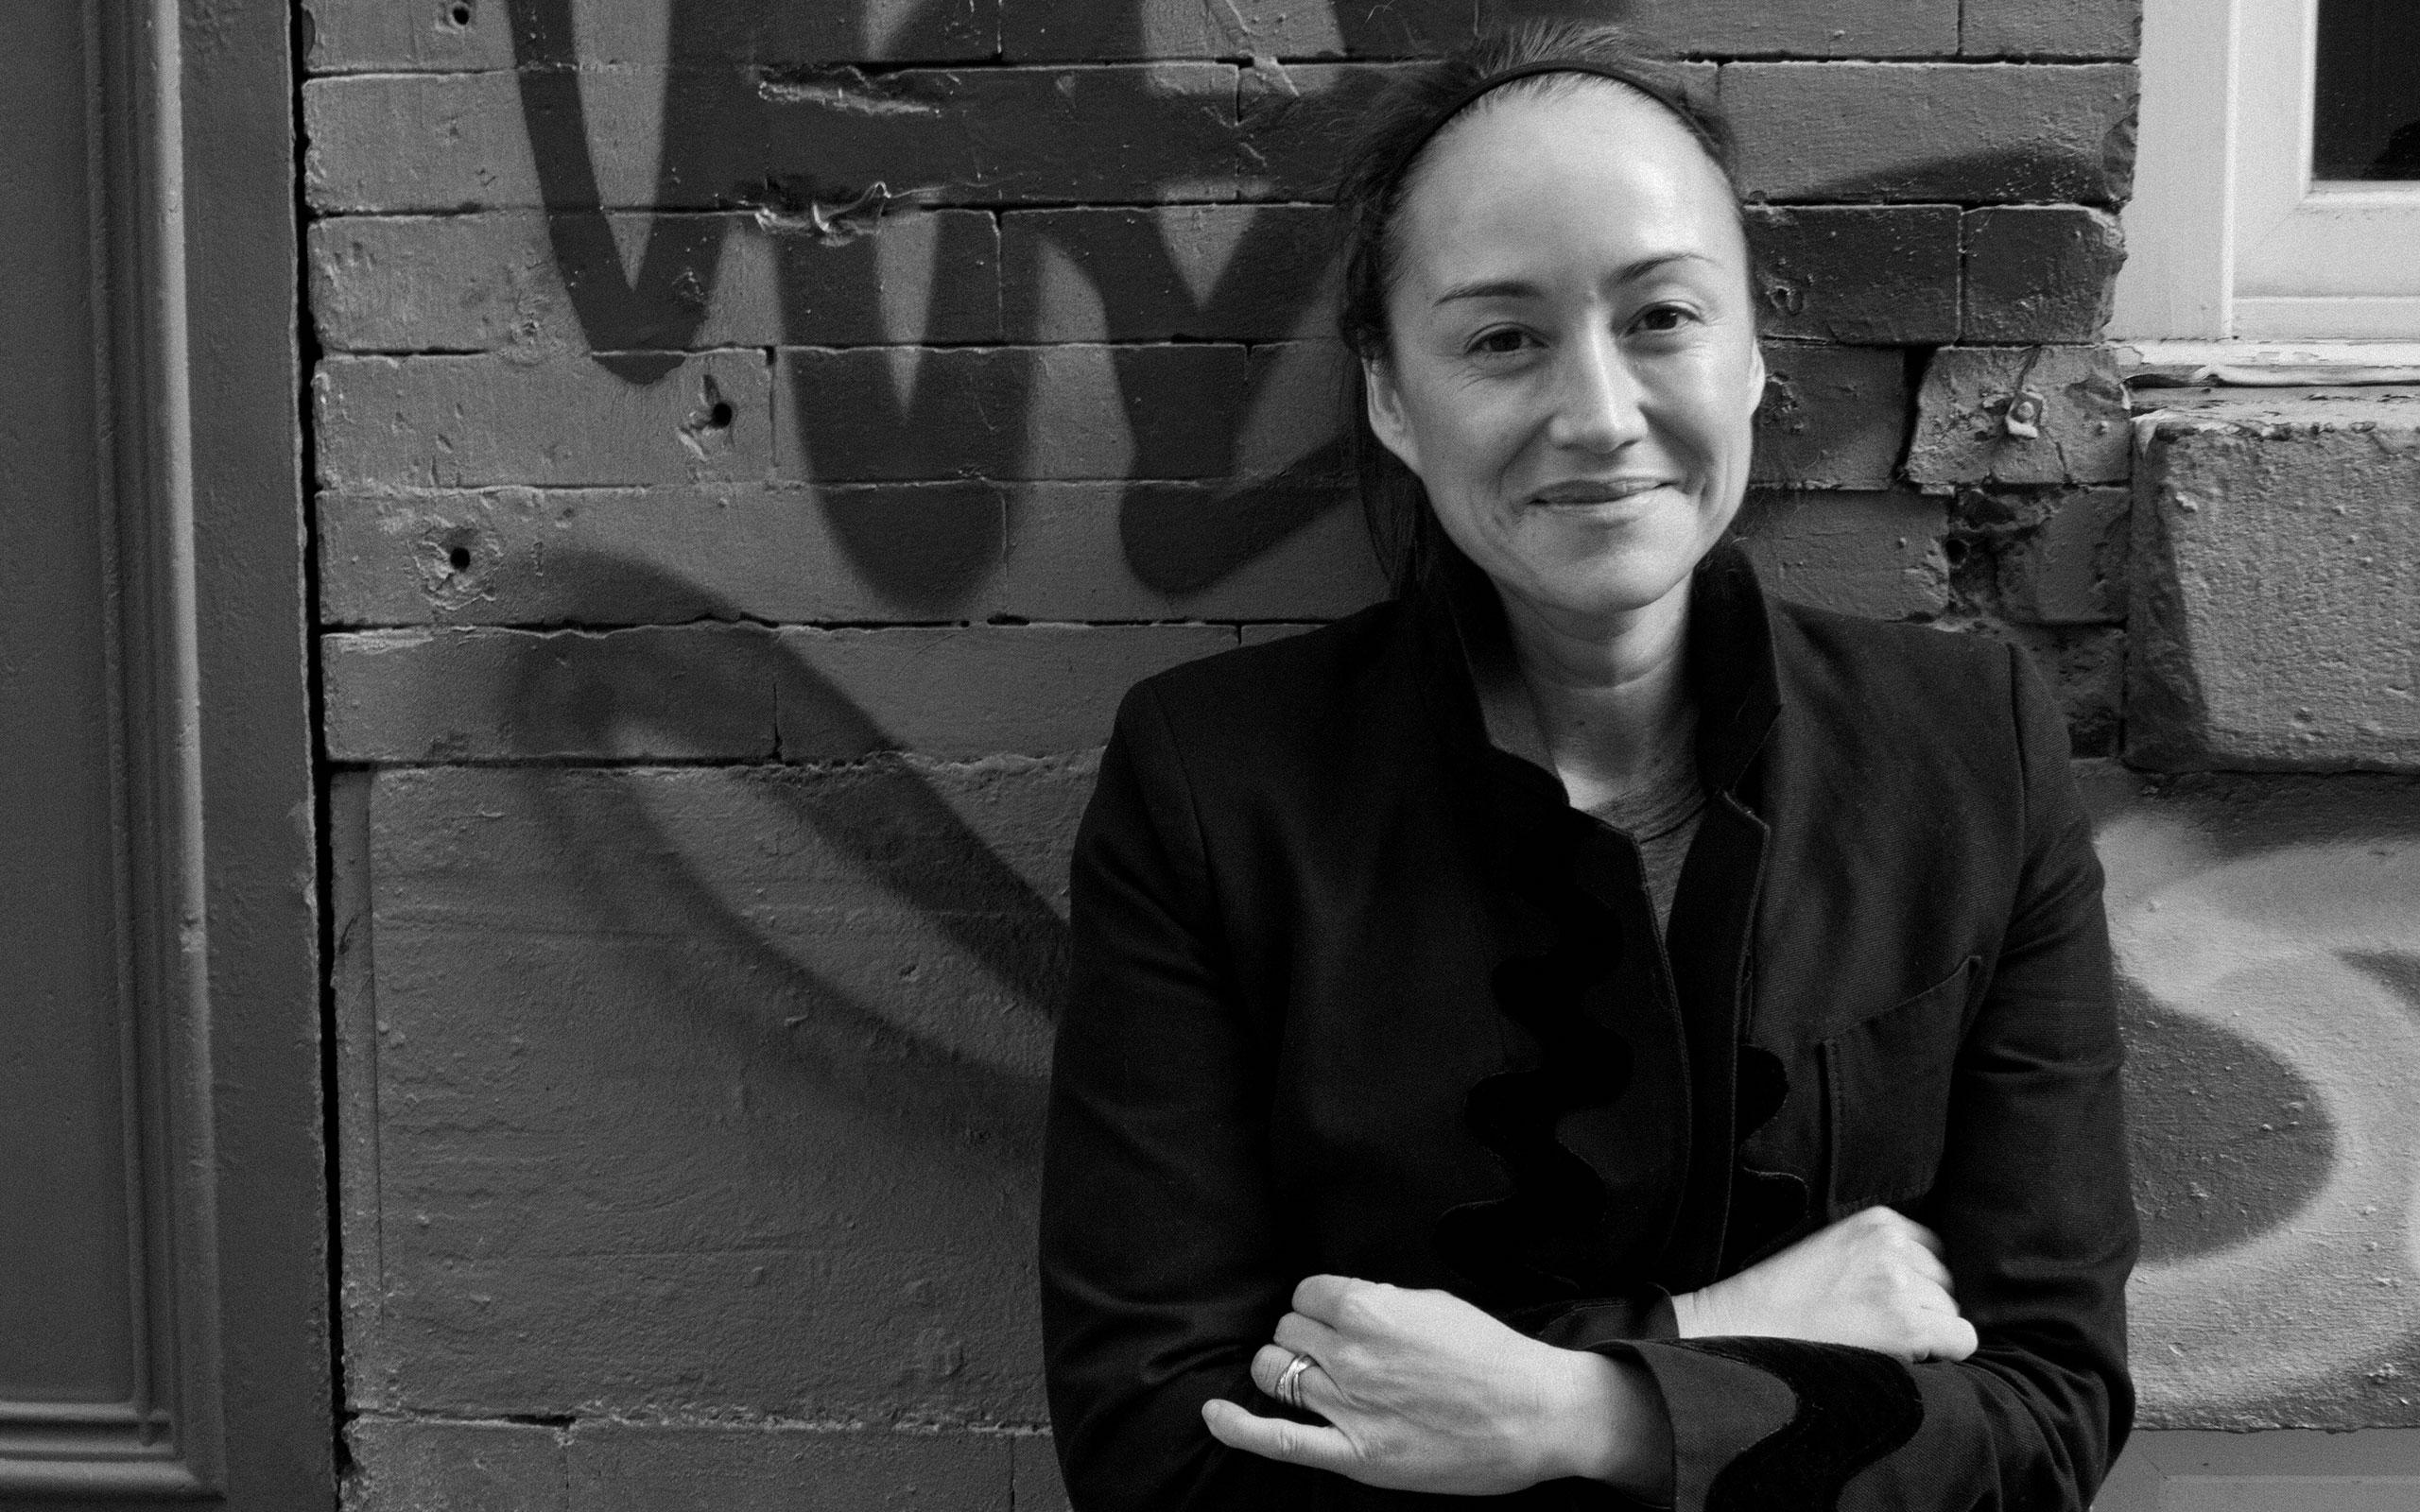 VFILES の創設者、Julie Anne Quay (ジュリー・アン・クウェイ) インタビュー